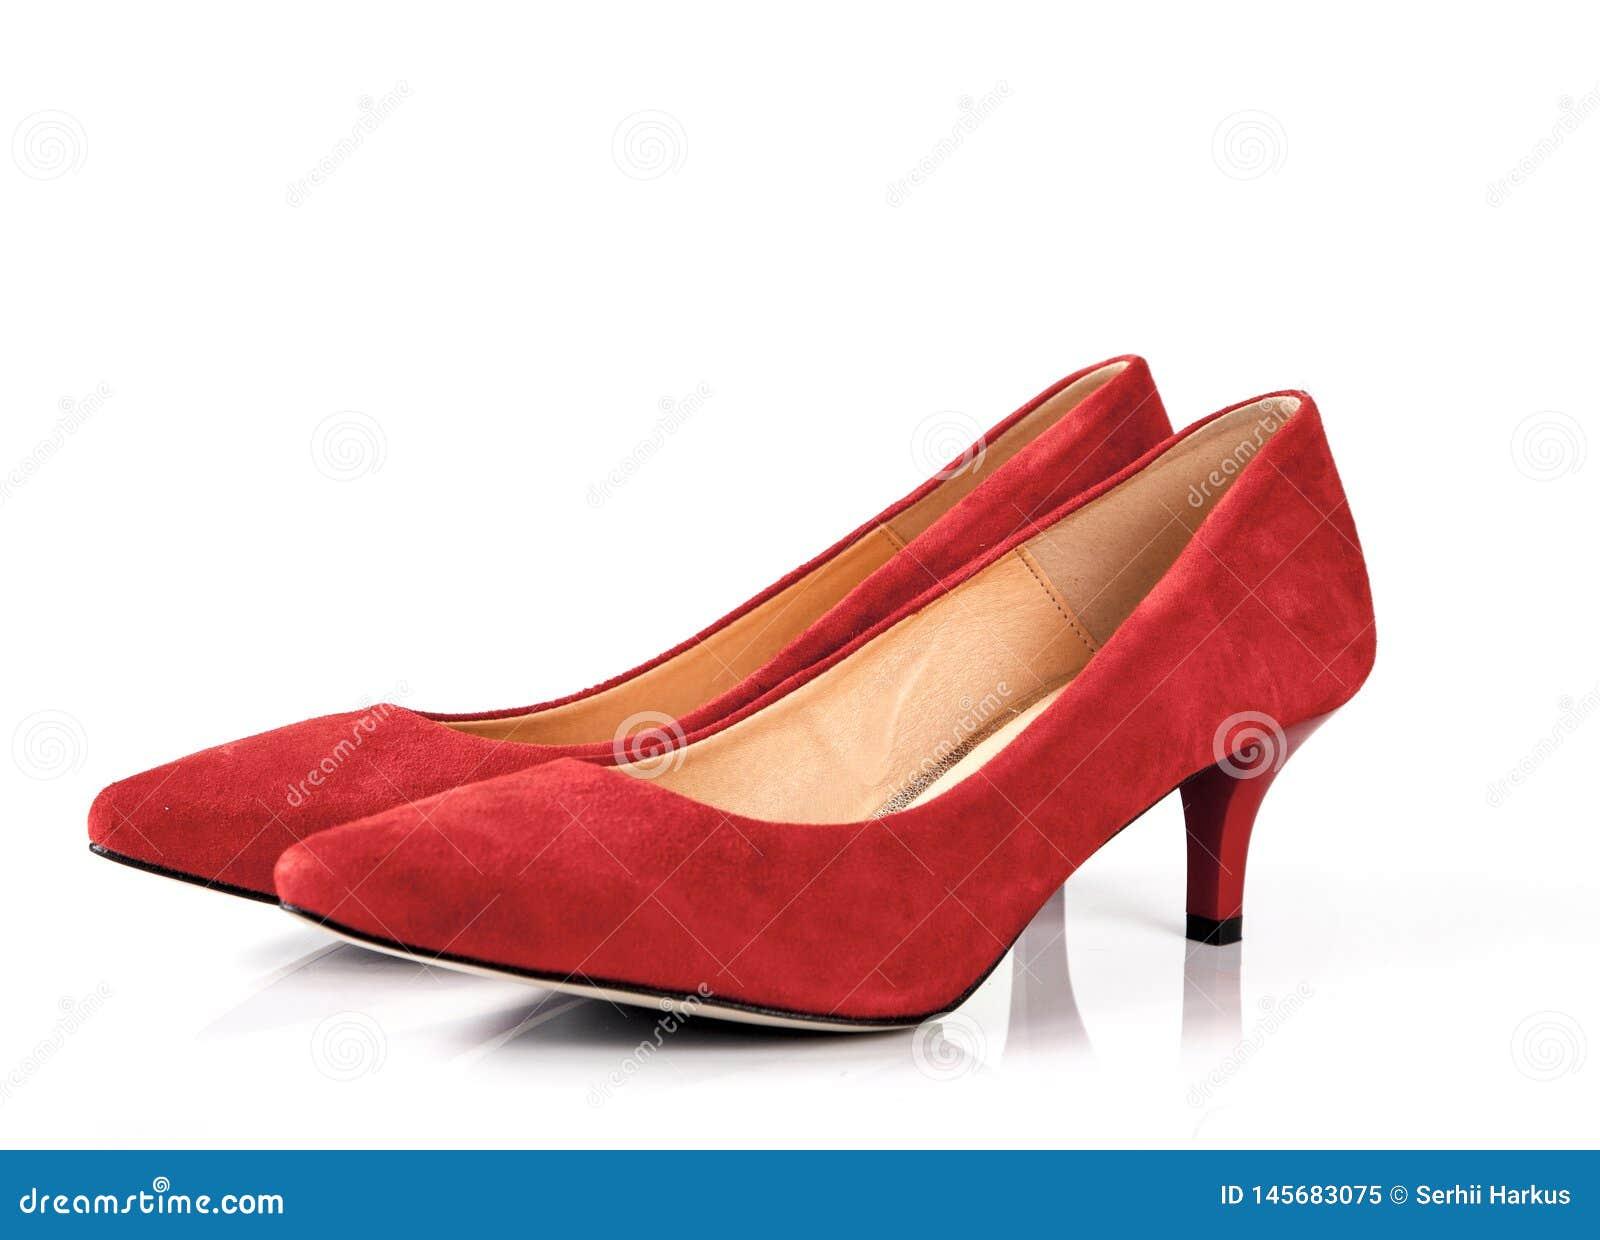 be8cc2e43ee Κόκκινα υψηλά παπούτσια γυναικών τακουνιών που απομονώνονται στο ...